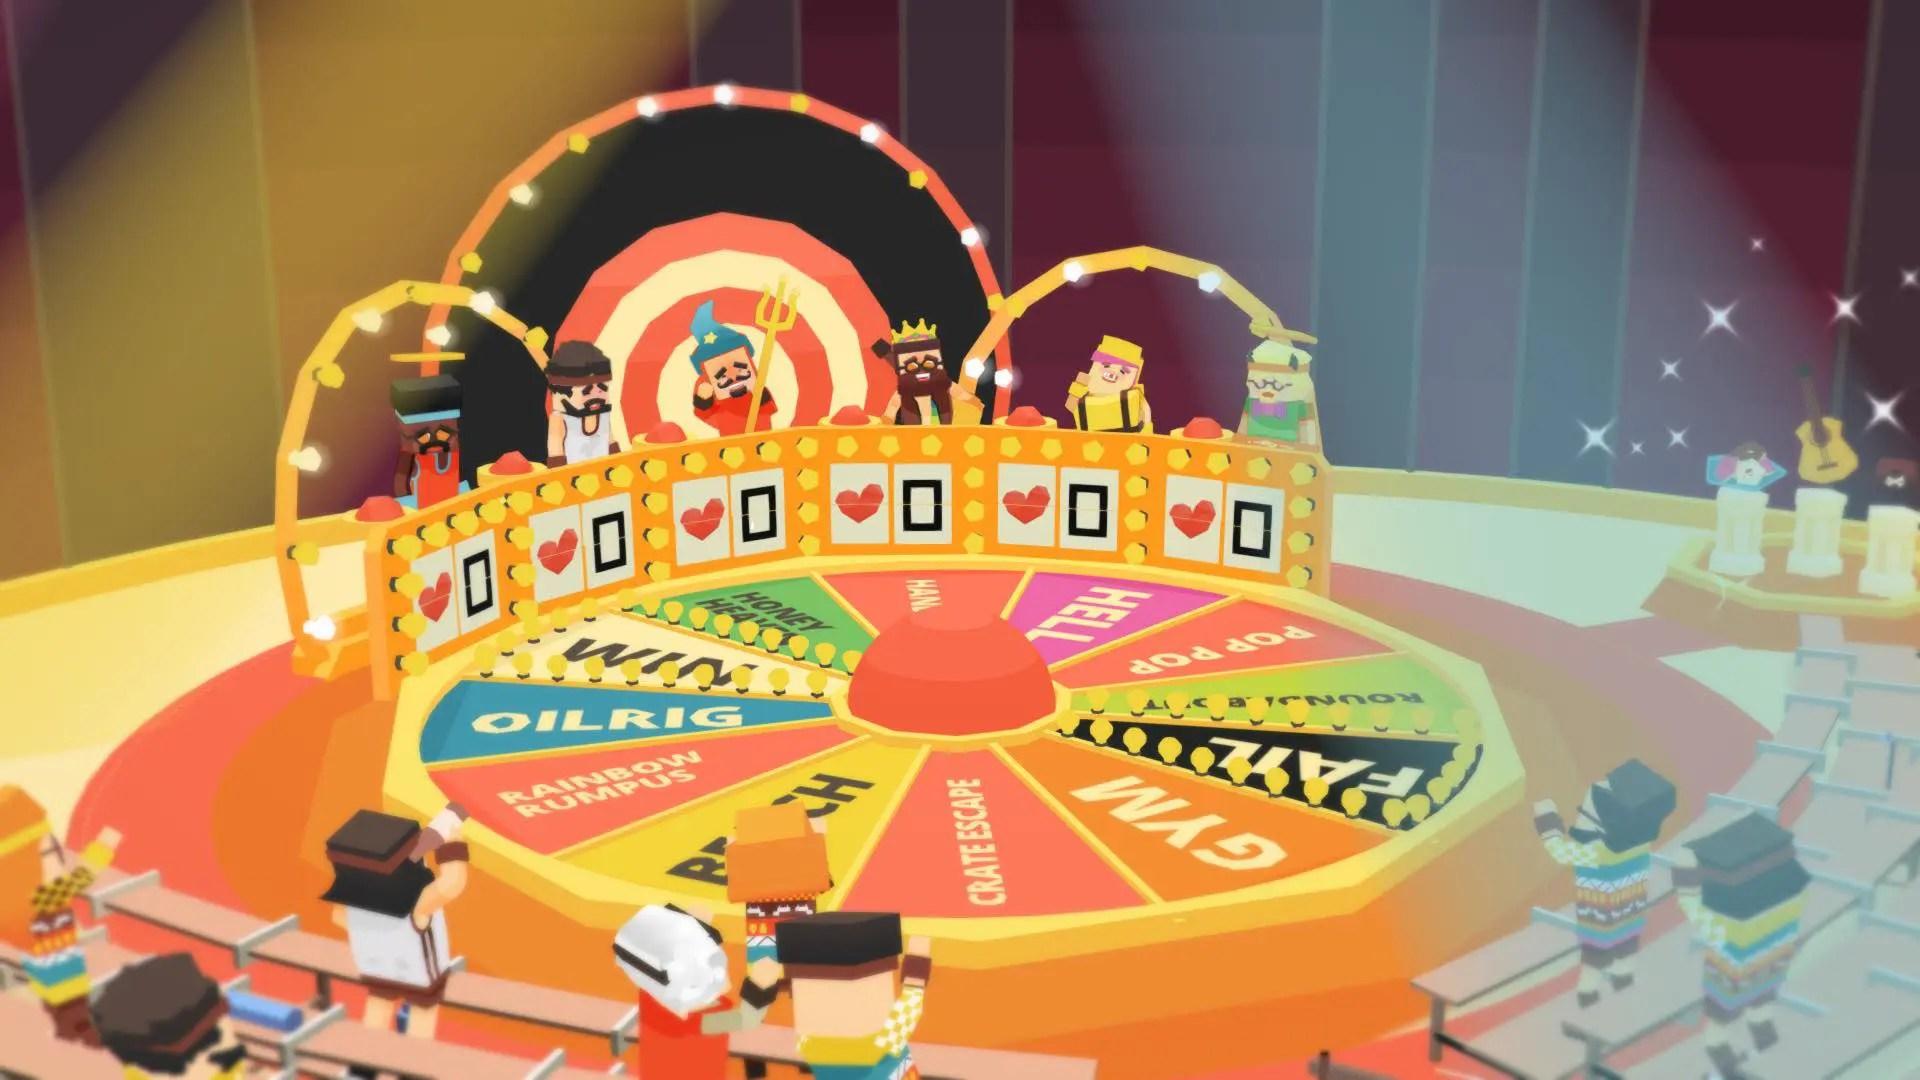 stikbold-a-dodgeball-adventure-deluxe-review-screenshot-1